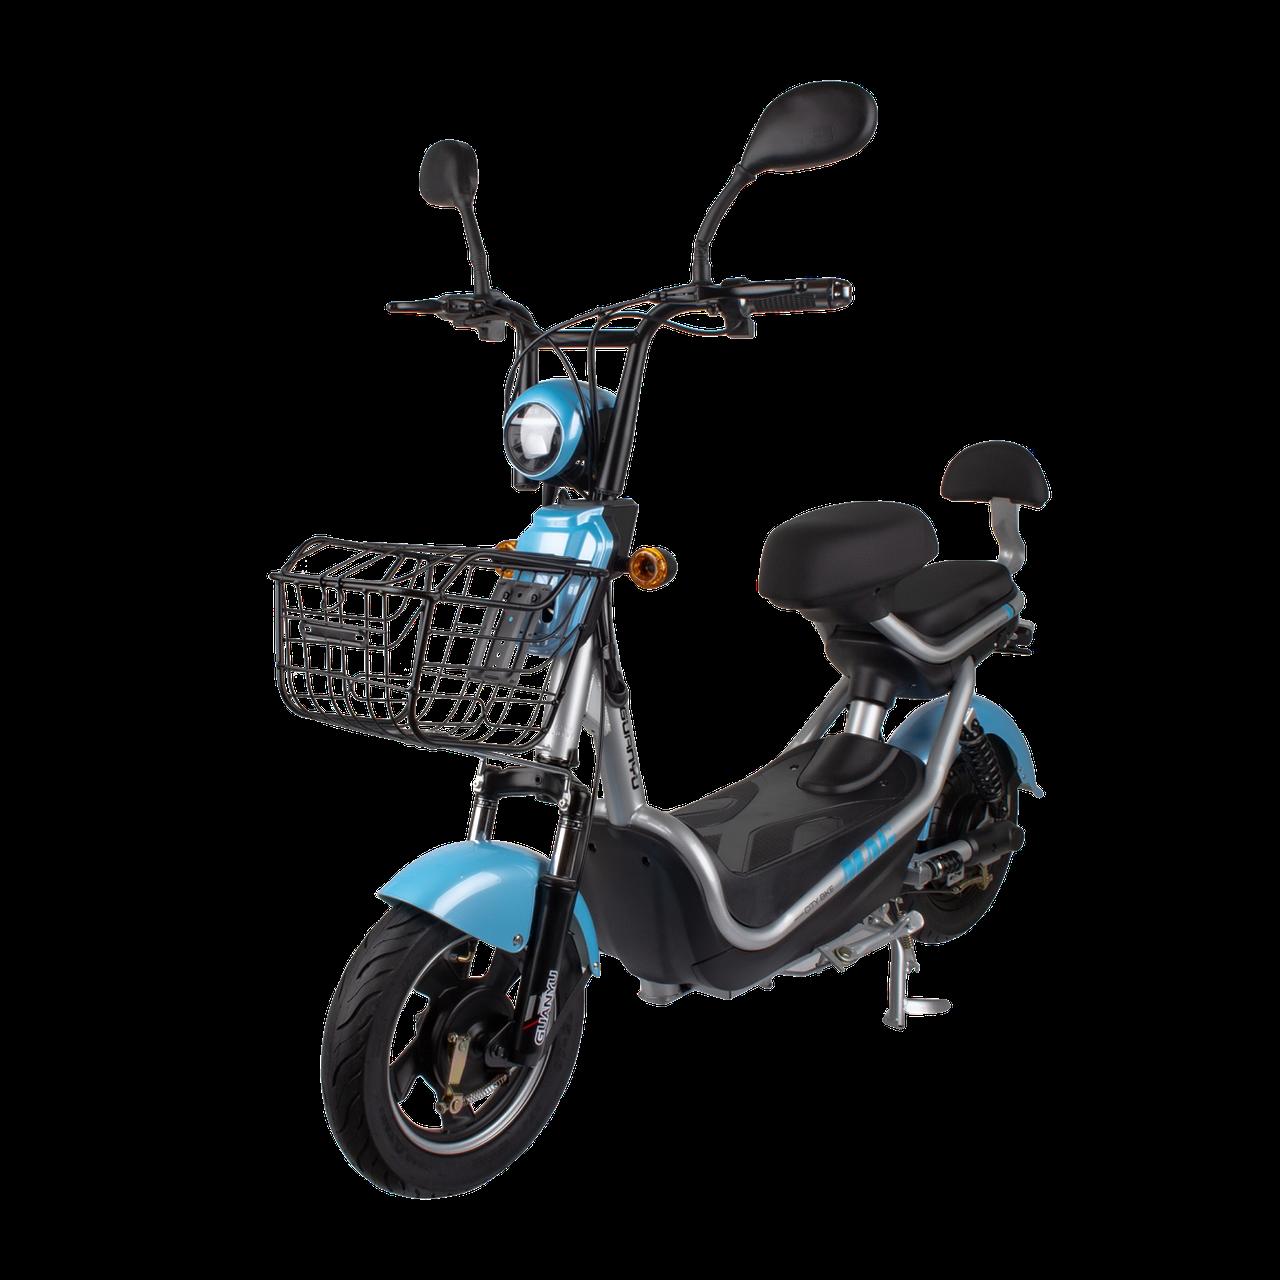 Электрический мопед  CITY gy-4 350W/48V/20AH(GL) (серо-голубой)